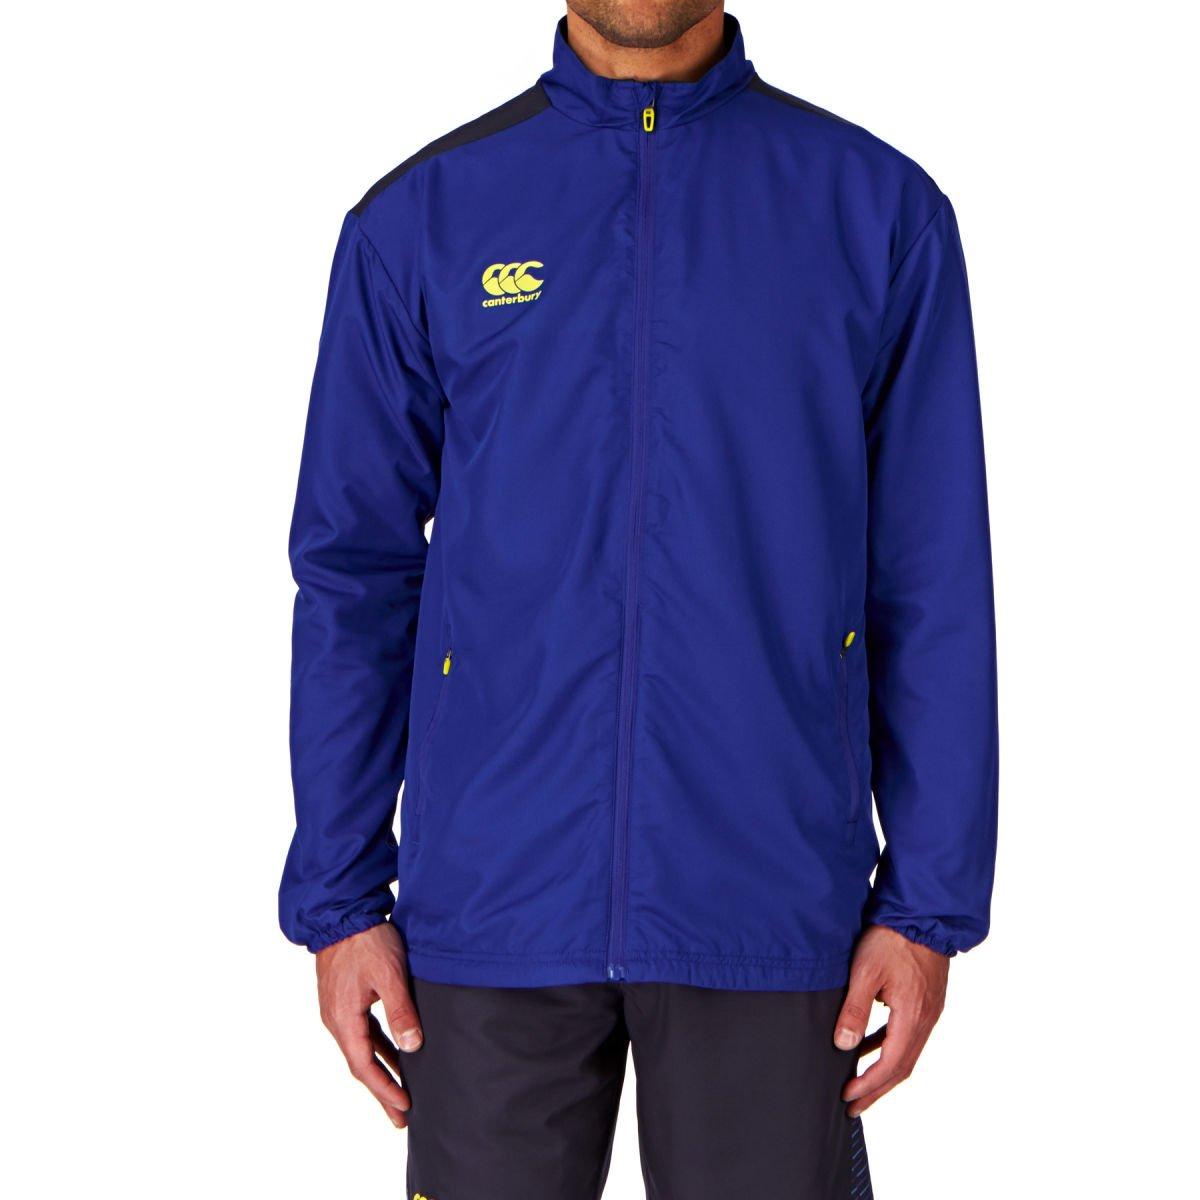 Canterbury Mercury TCR Track Jacket, Mazarine Blue E583276-T39 21/6-1